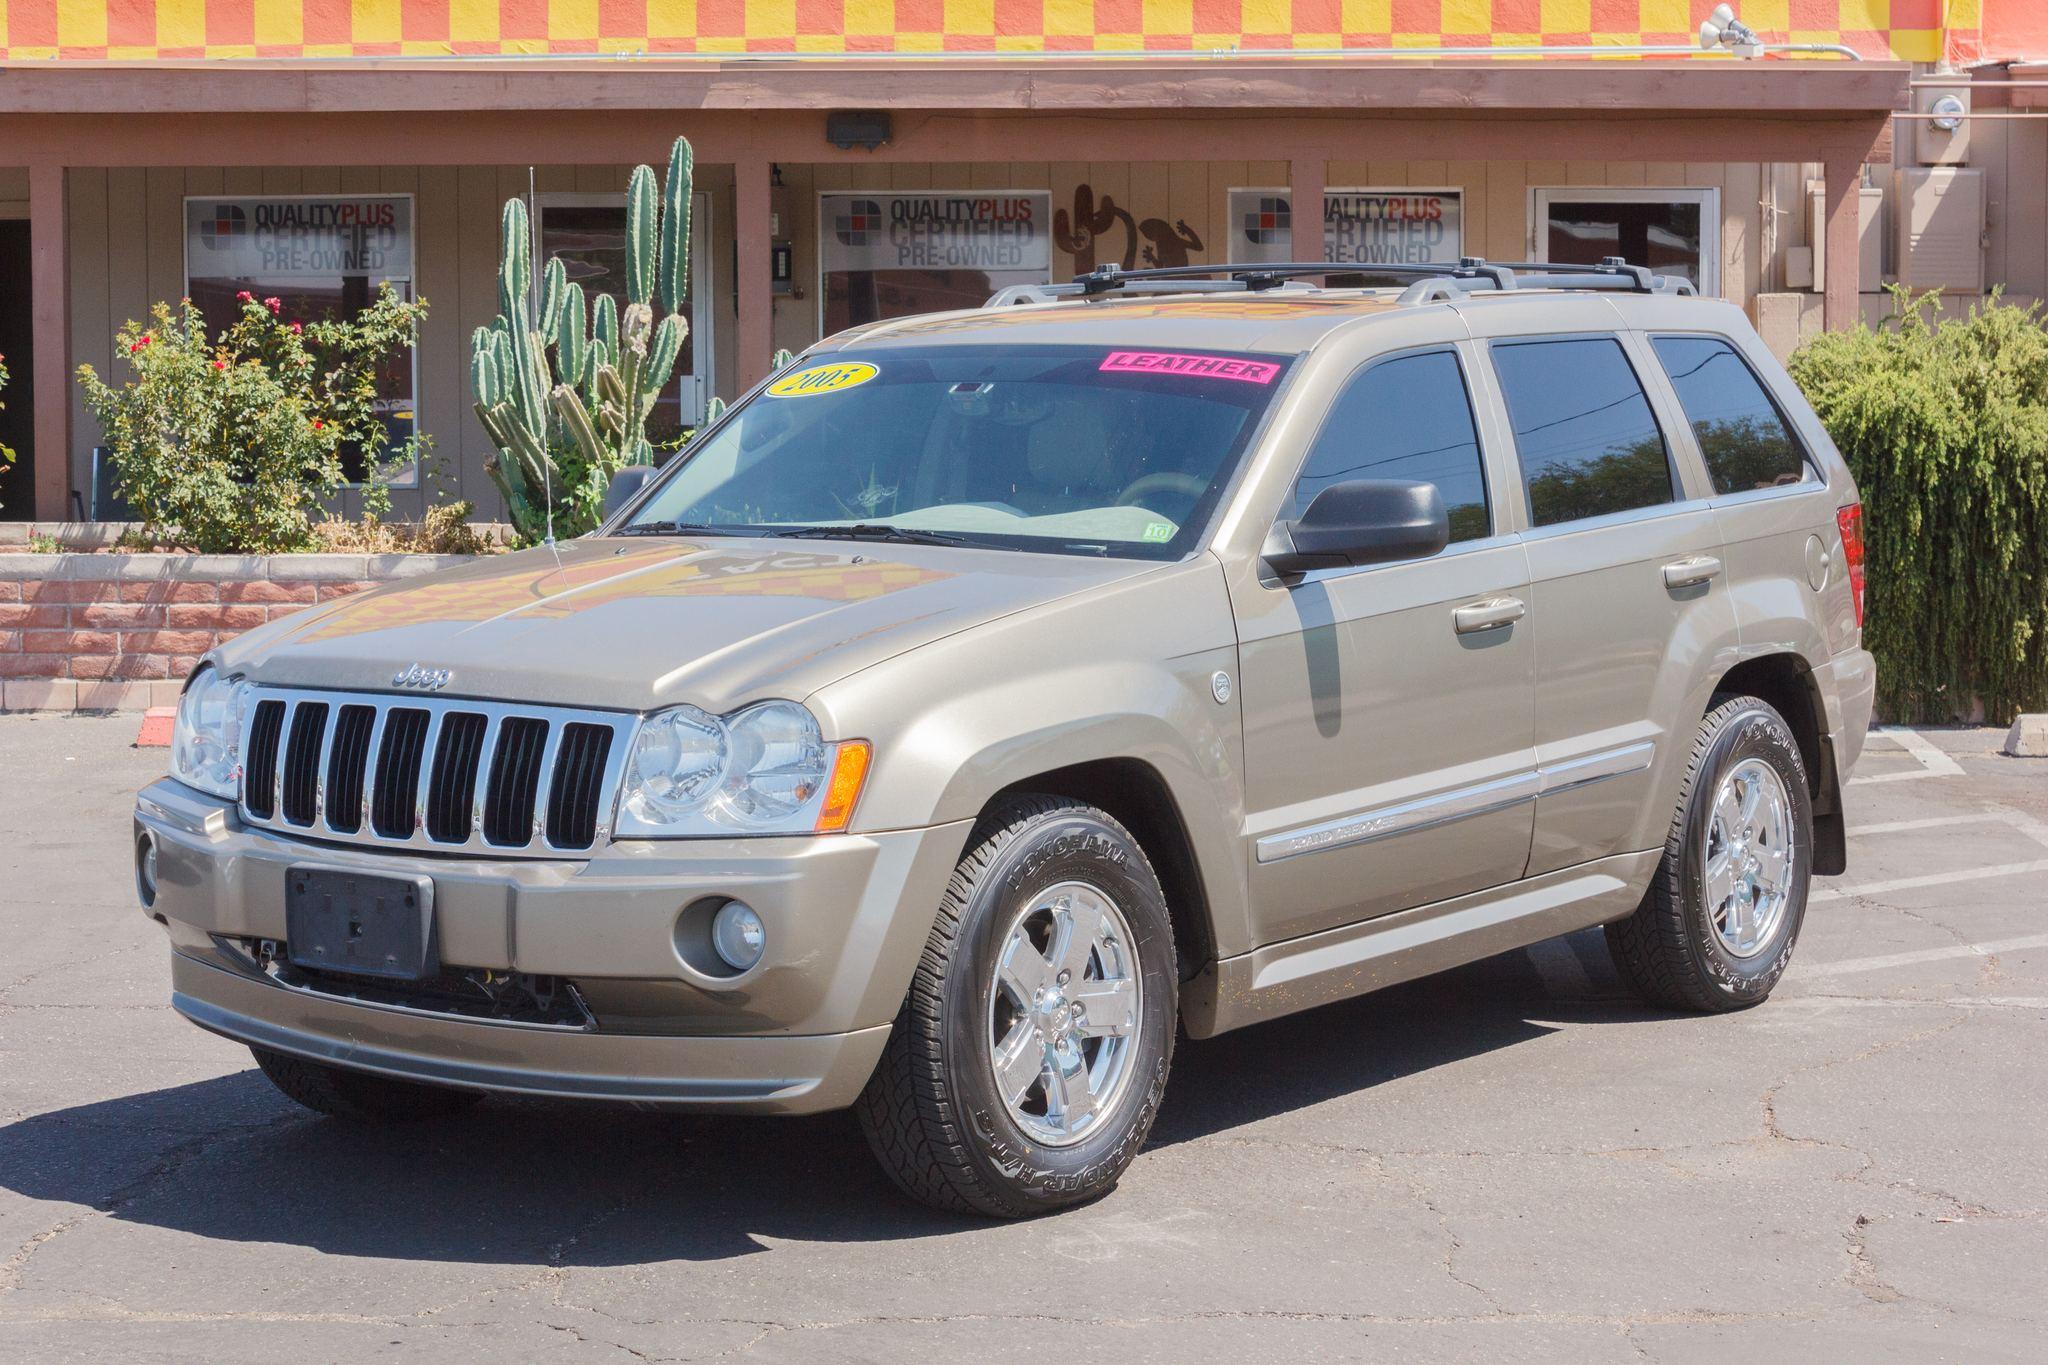 Photo of 2005 Jeep Grand Cherokee 4WD 4d Wagon Limited Hemi Dark Khaki Pearlcoat